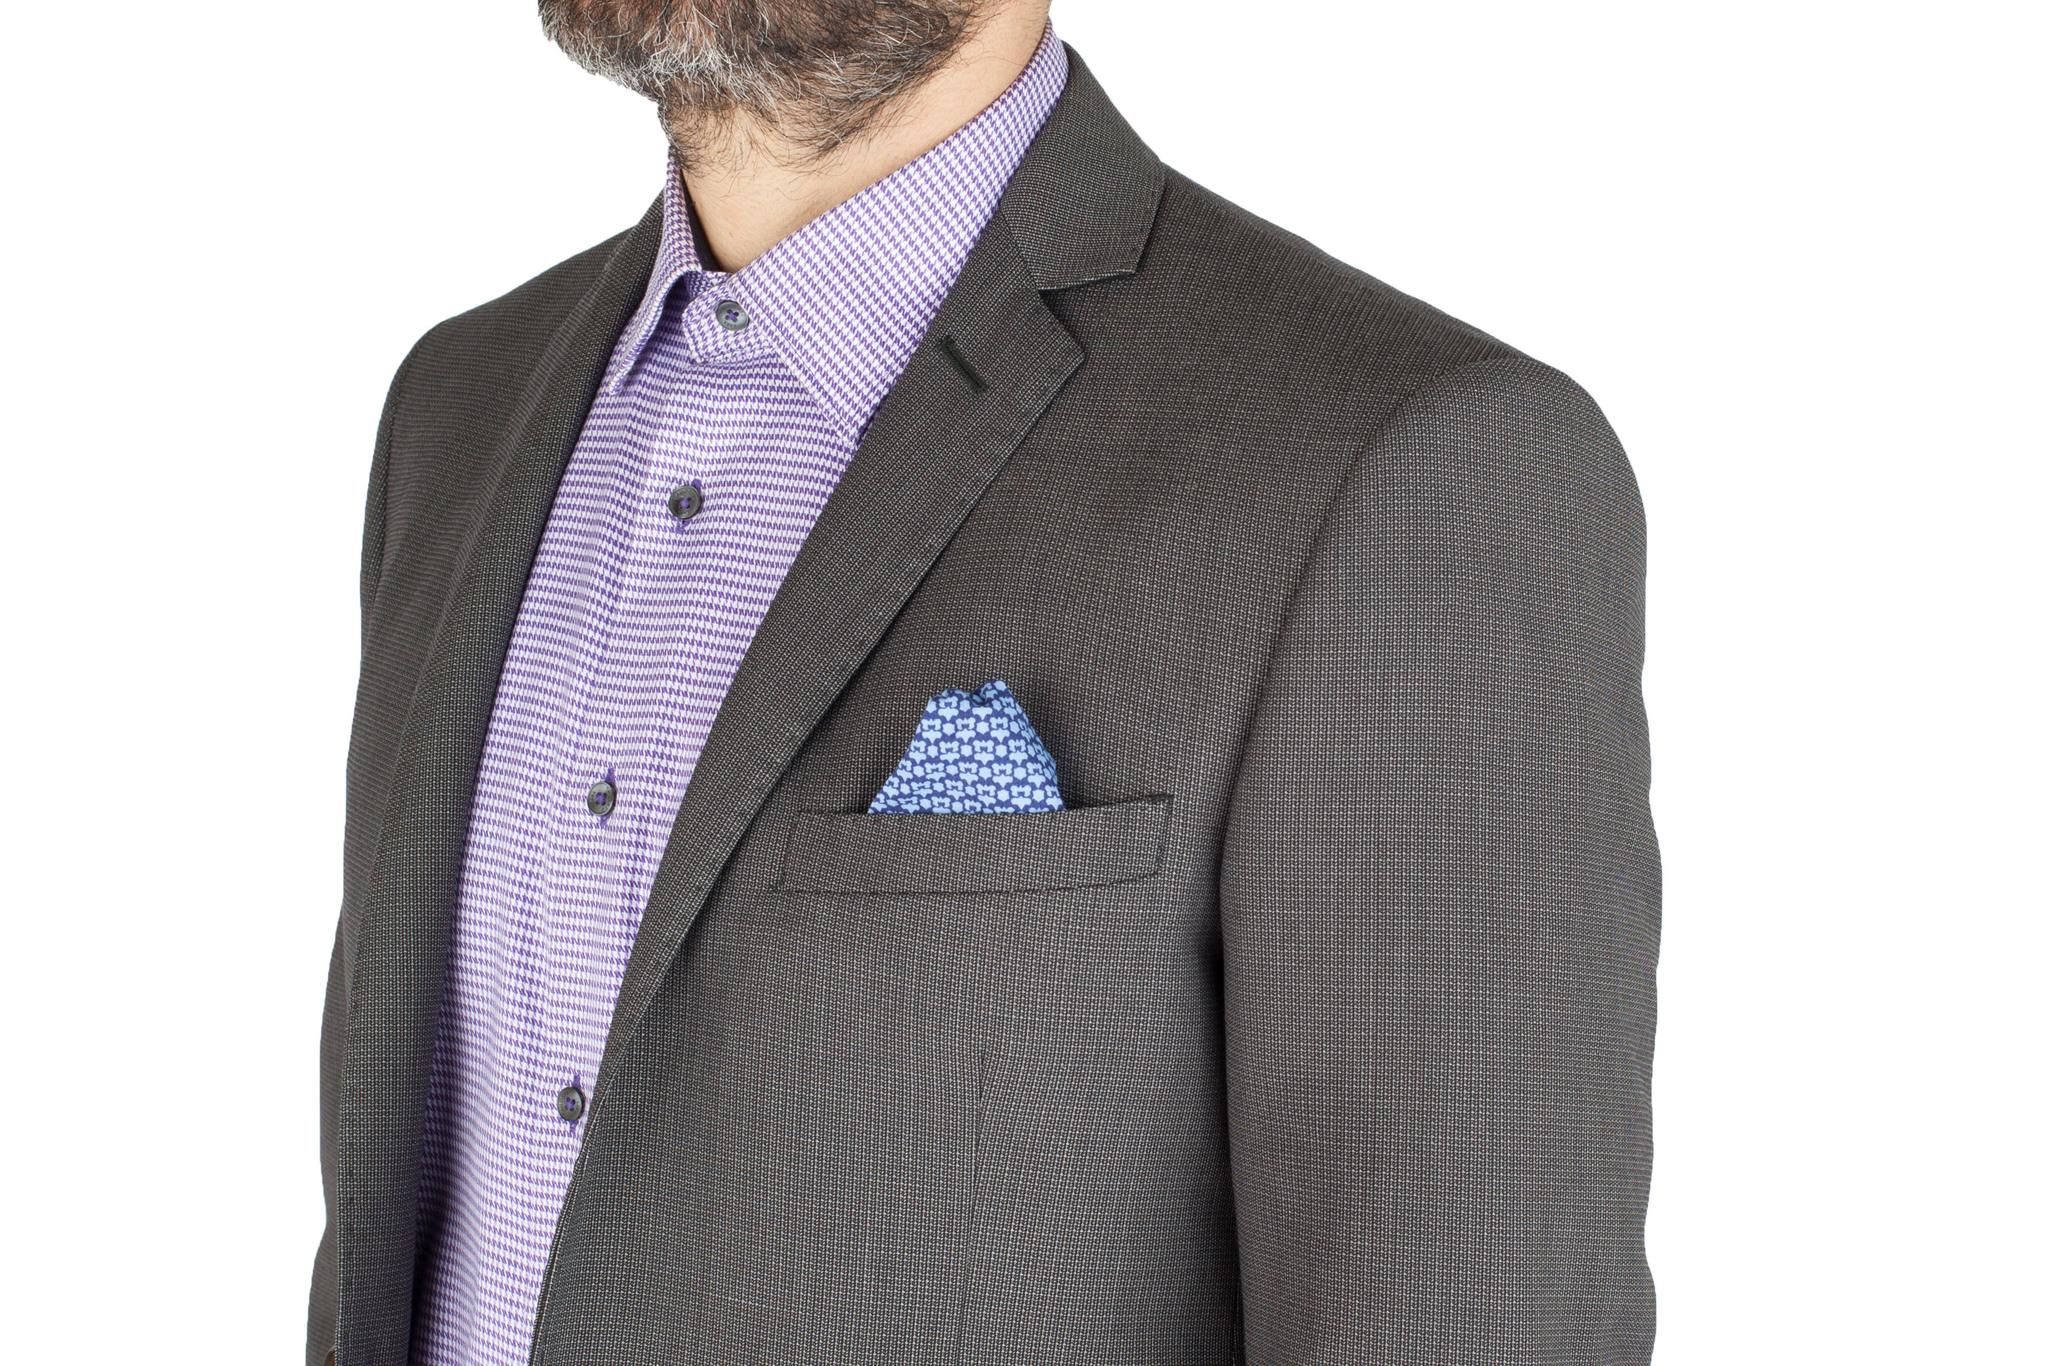 Серый шерстяной костюм, нагрудный карман